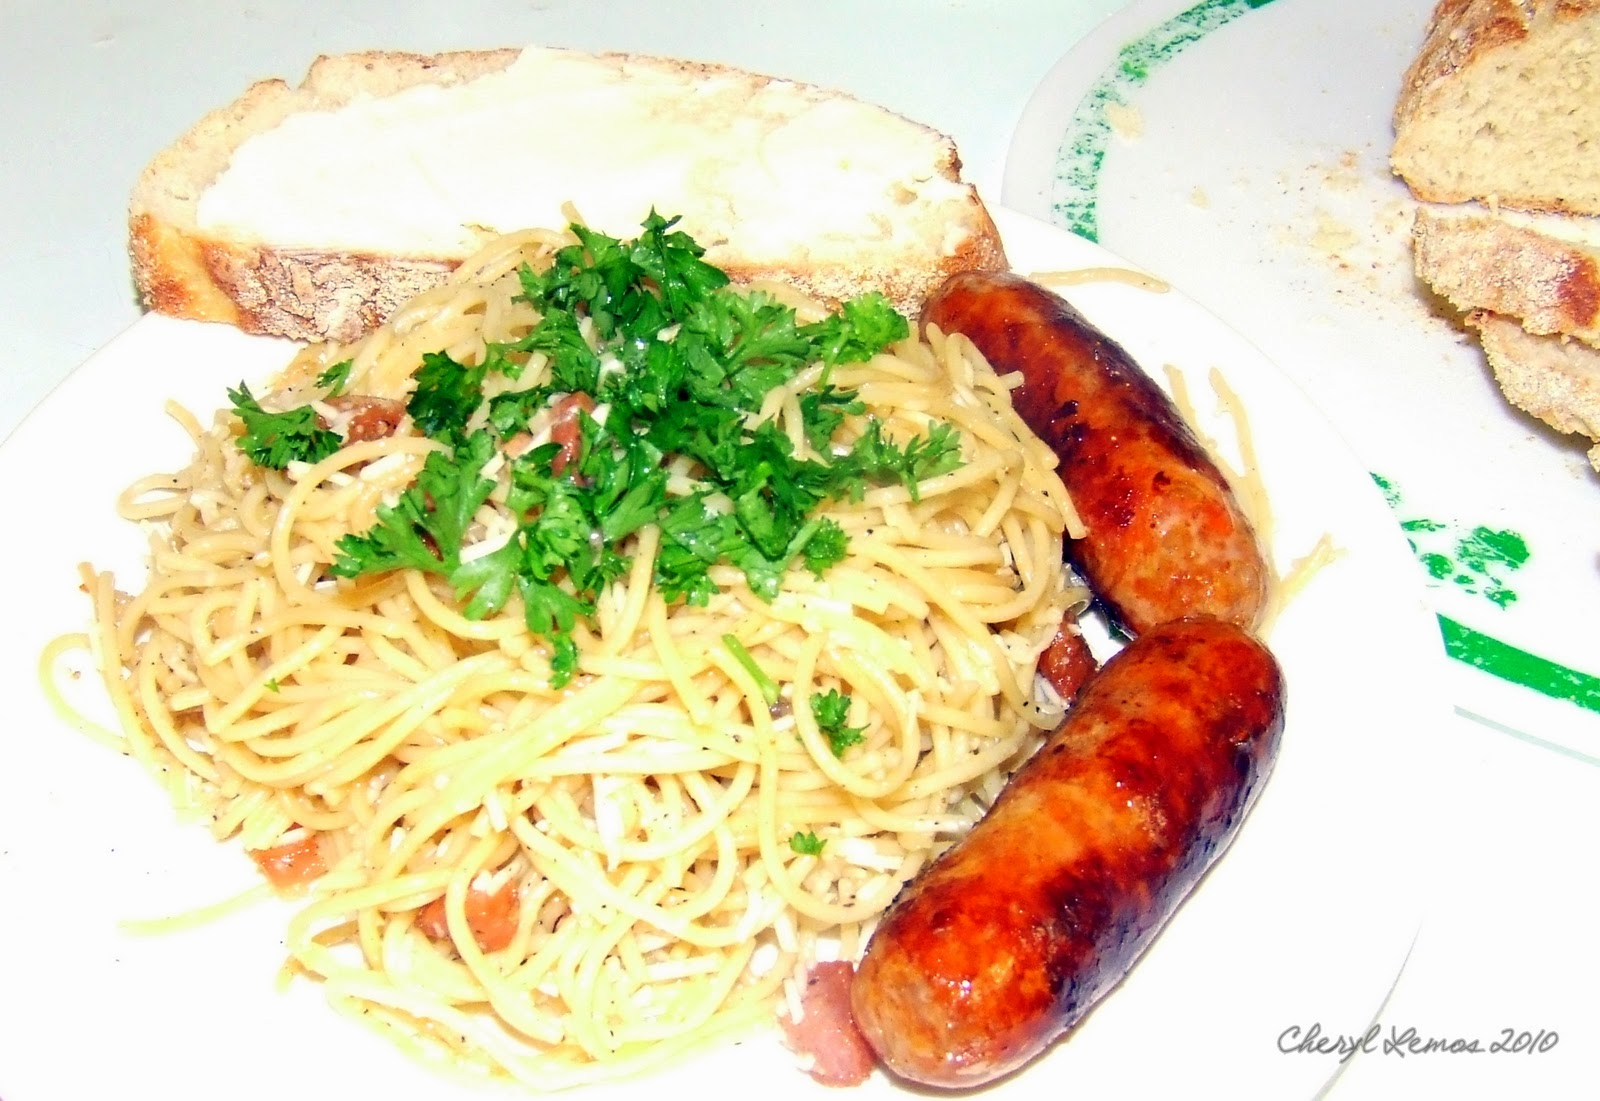 http://2.bp.blogspot.com/_9g1Ege5PHsE/TP0SCv9nWII/AAAAAAAAC1c/10A9aQzRirk/s1600/Cooking+eddie+fuzz+225.jpg